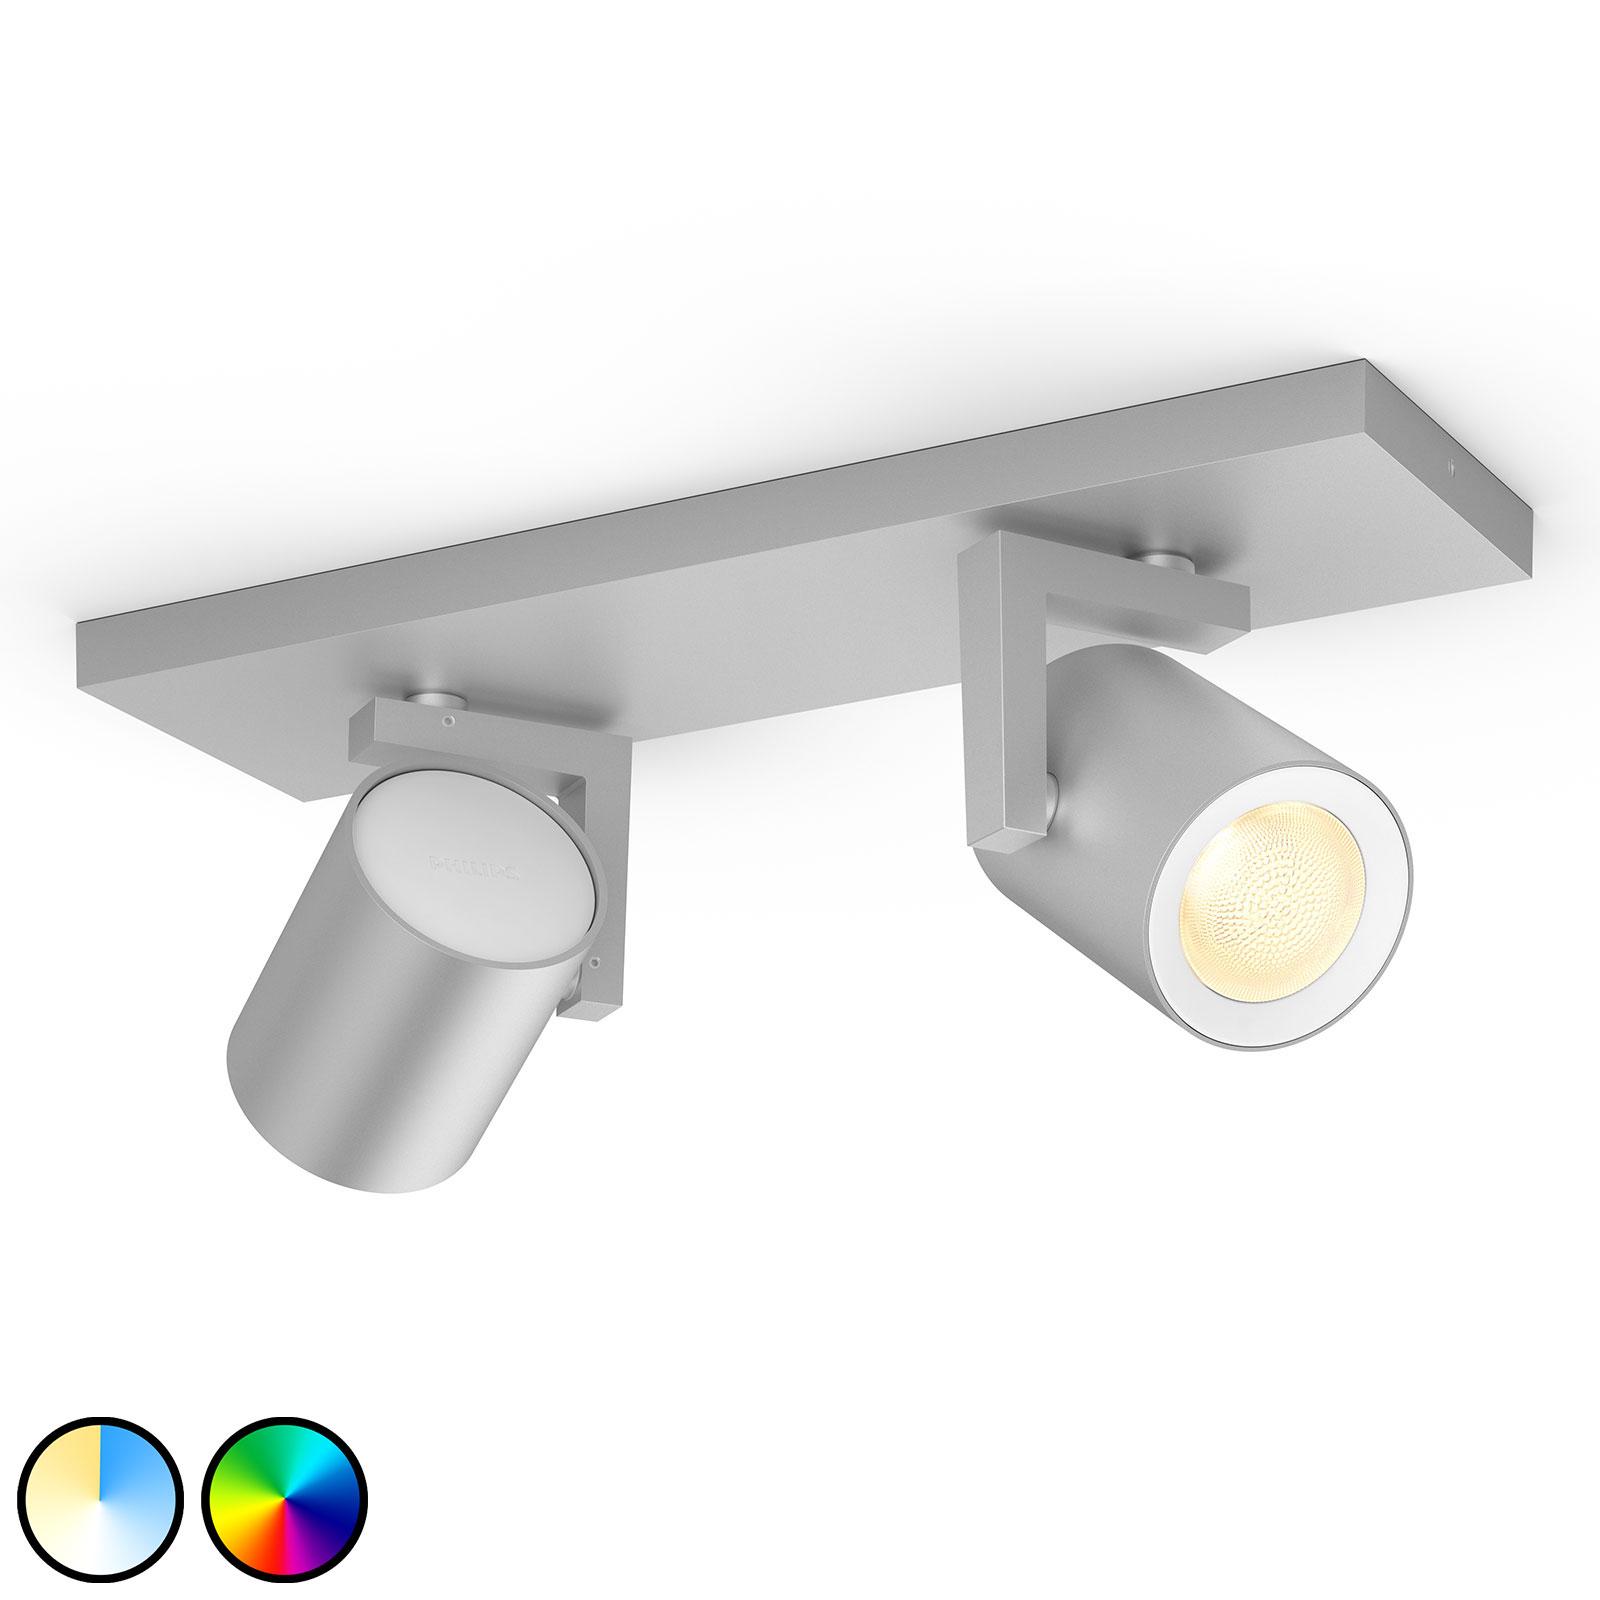 Philips Hue Argenta foco LED, 2 luces, aluminio